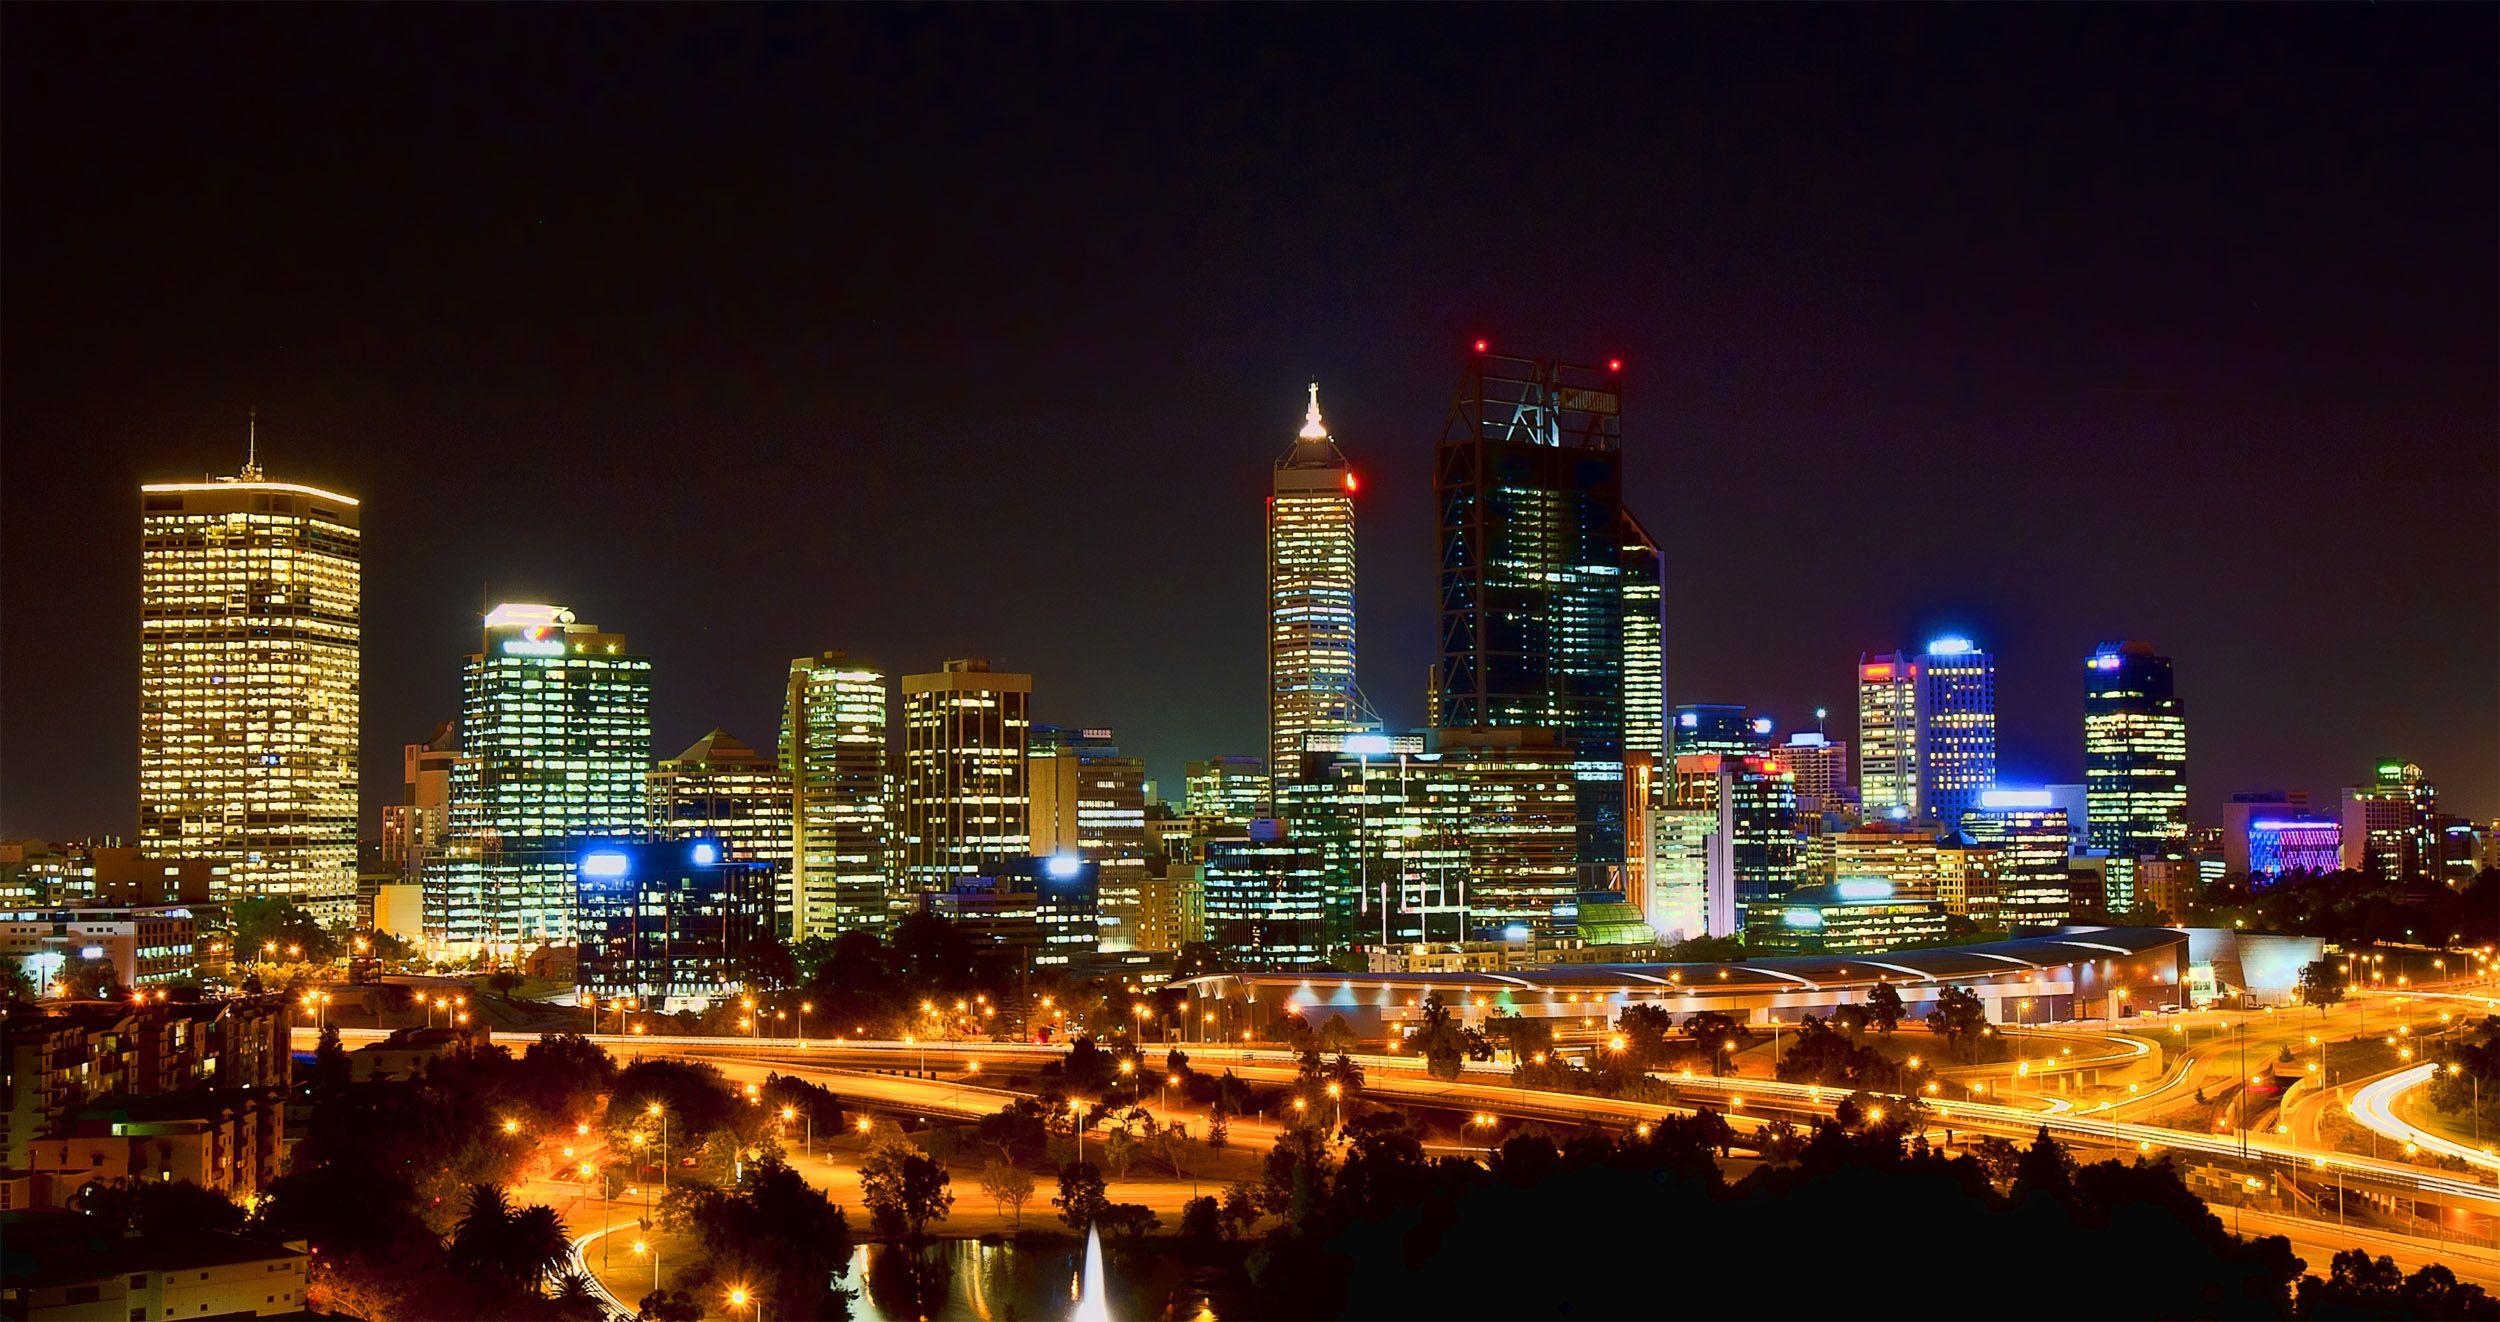 Landscape Photography Google Search Wonderful Places Kings Park Night City